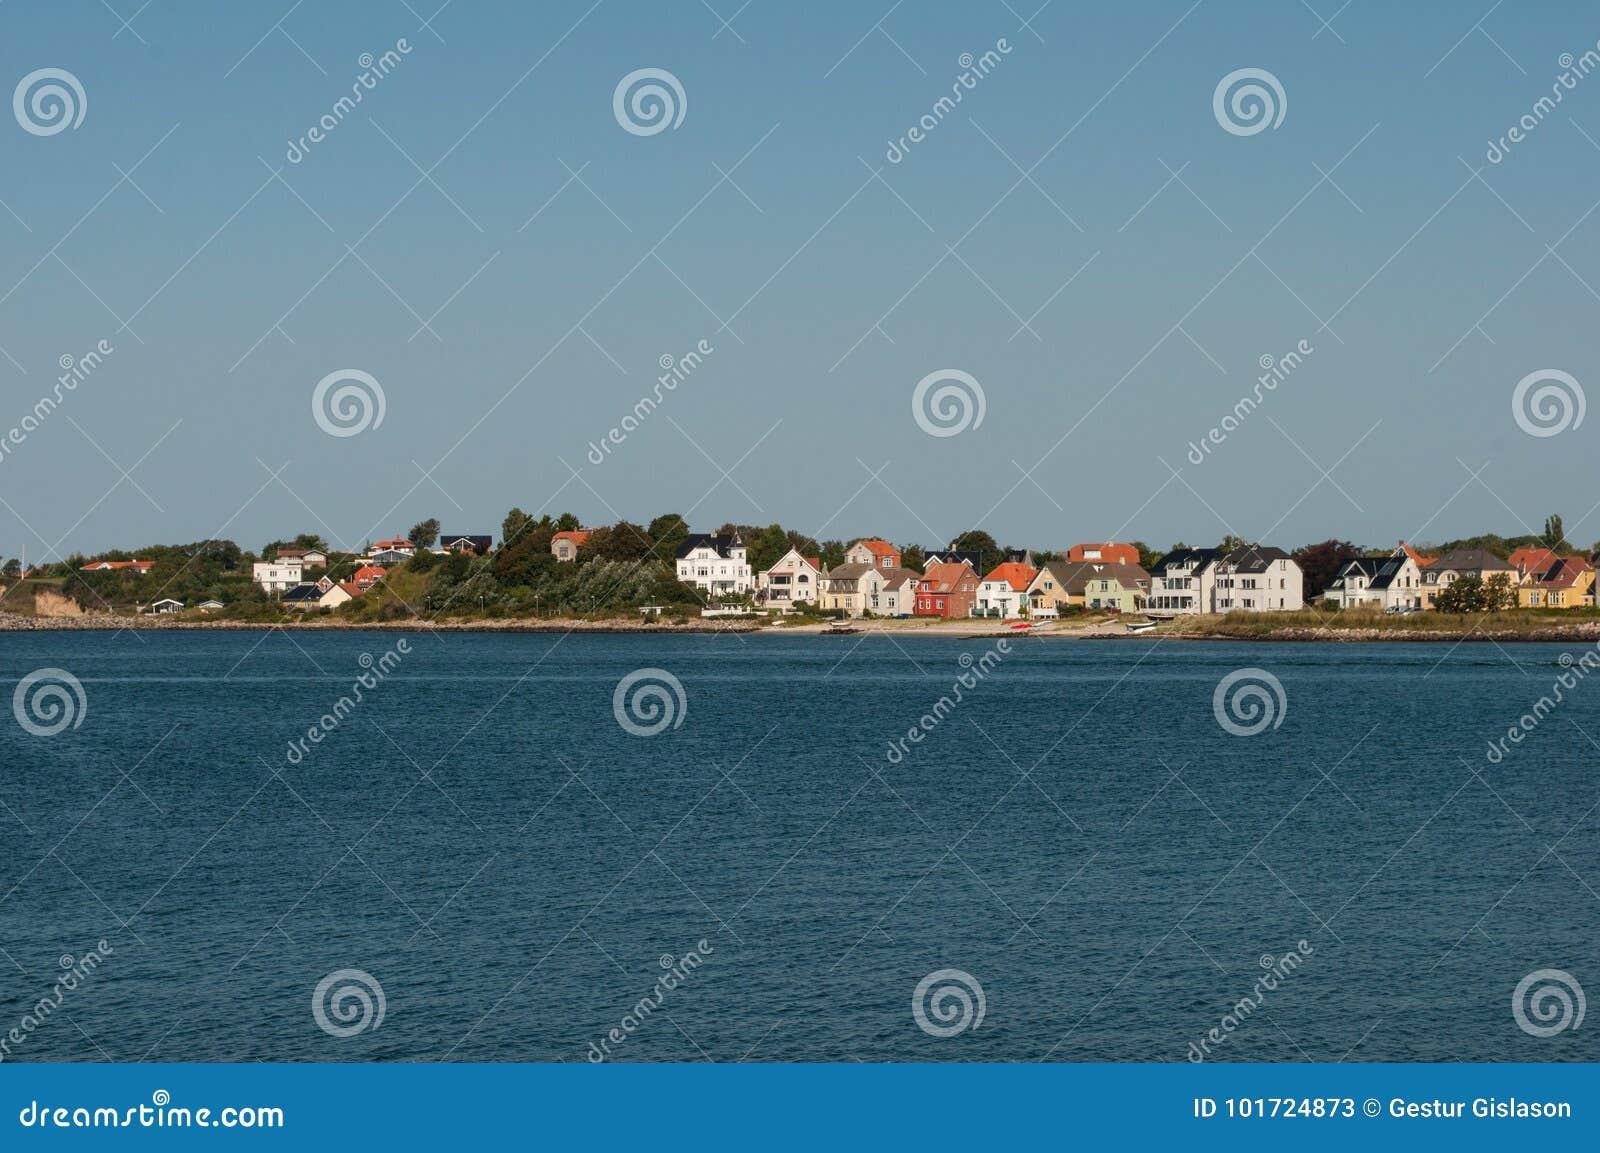 Città di Korsoer in Danimarca